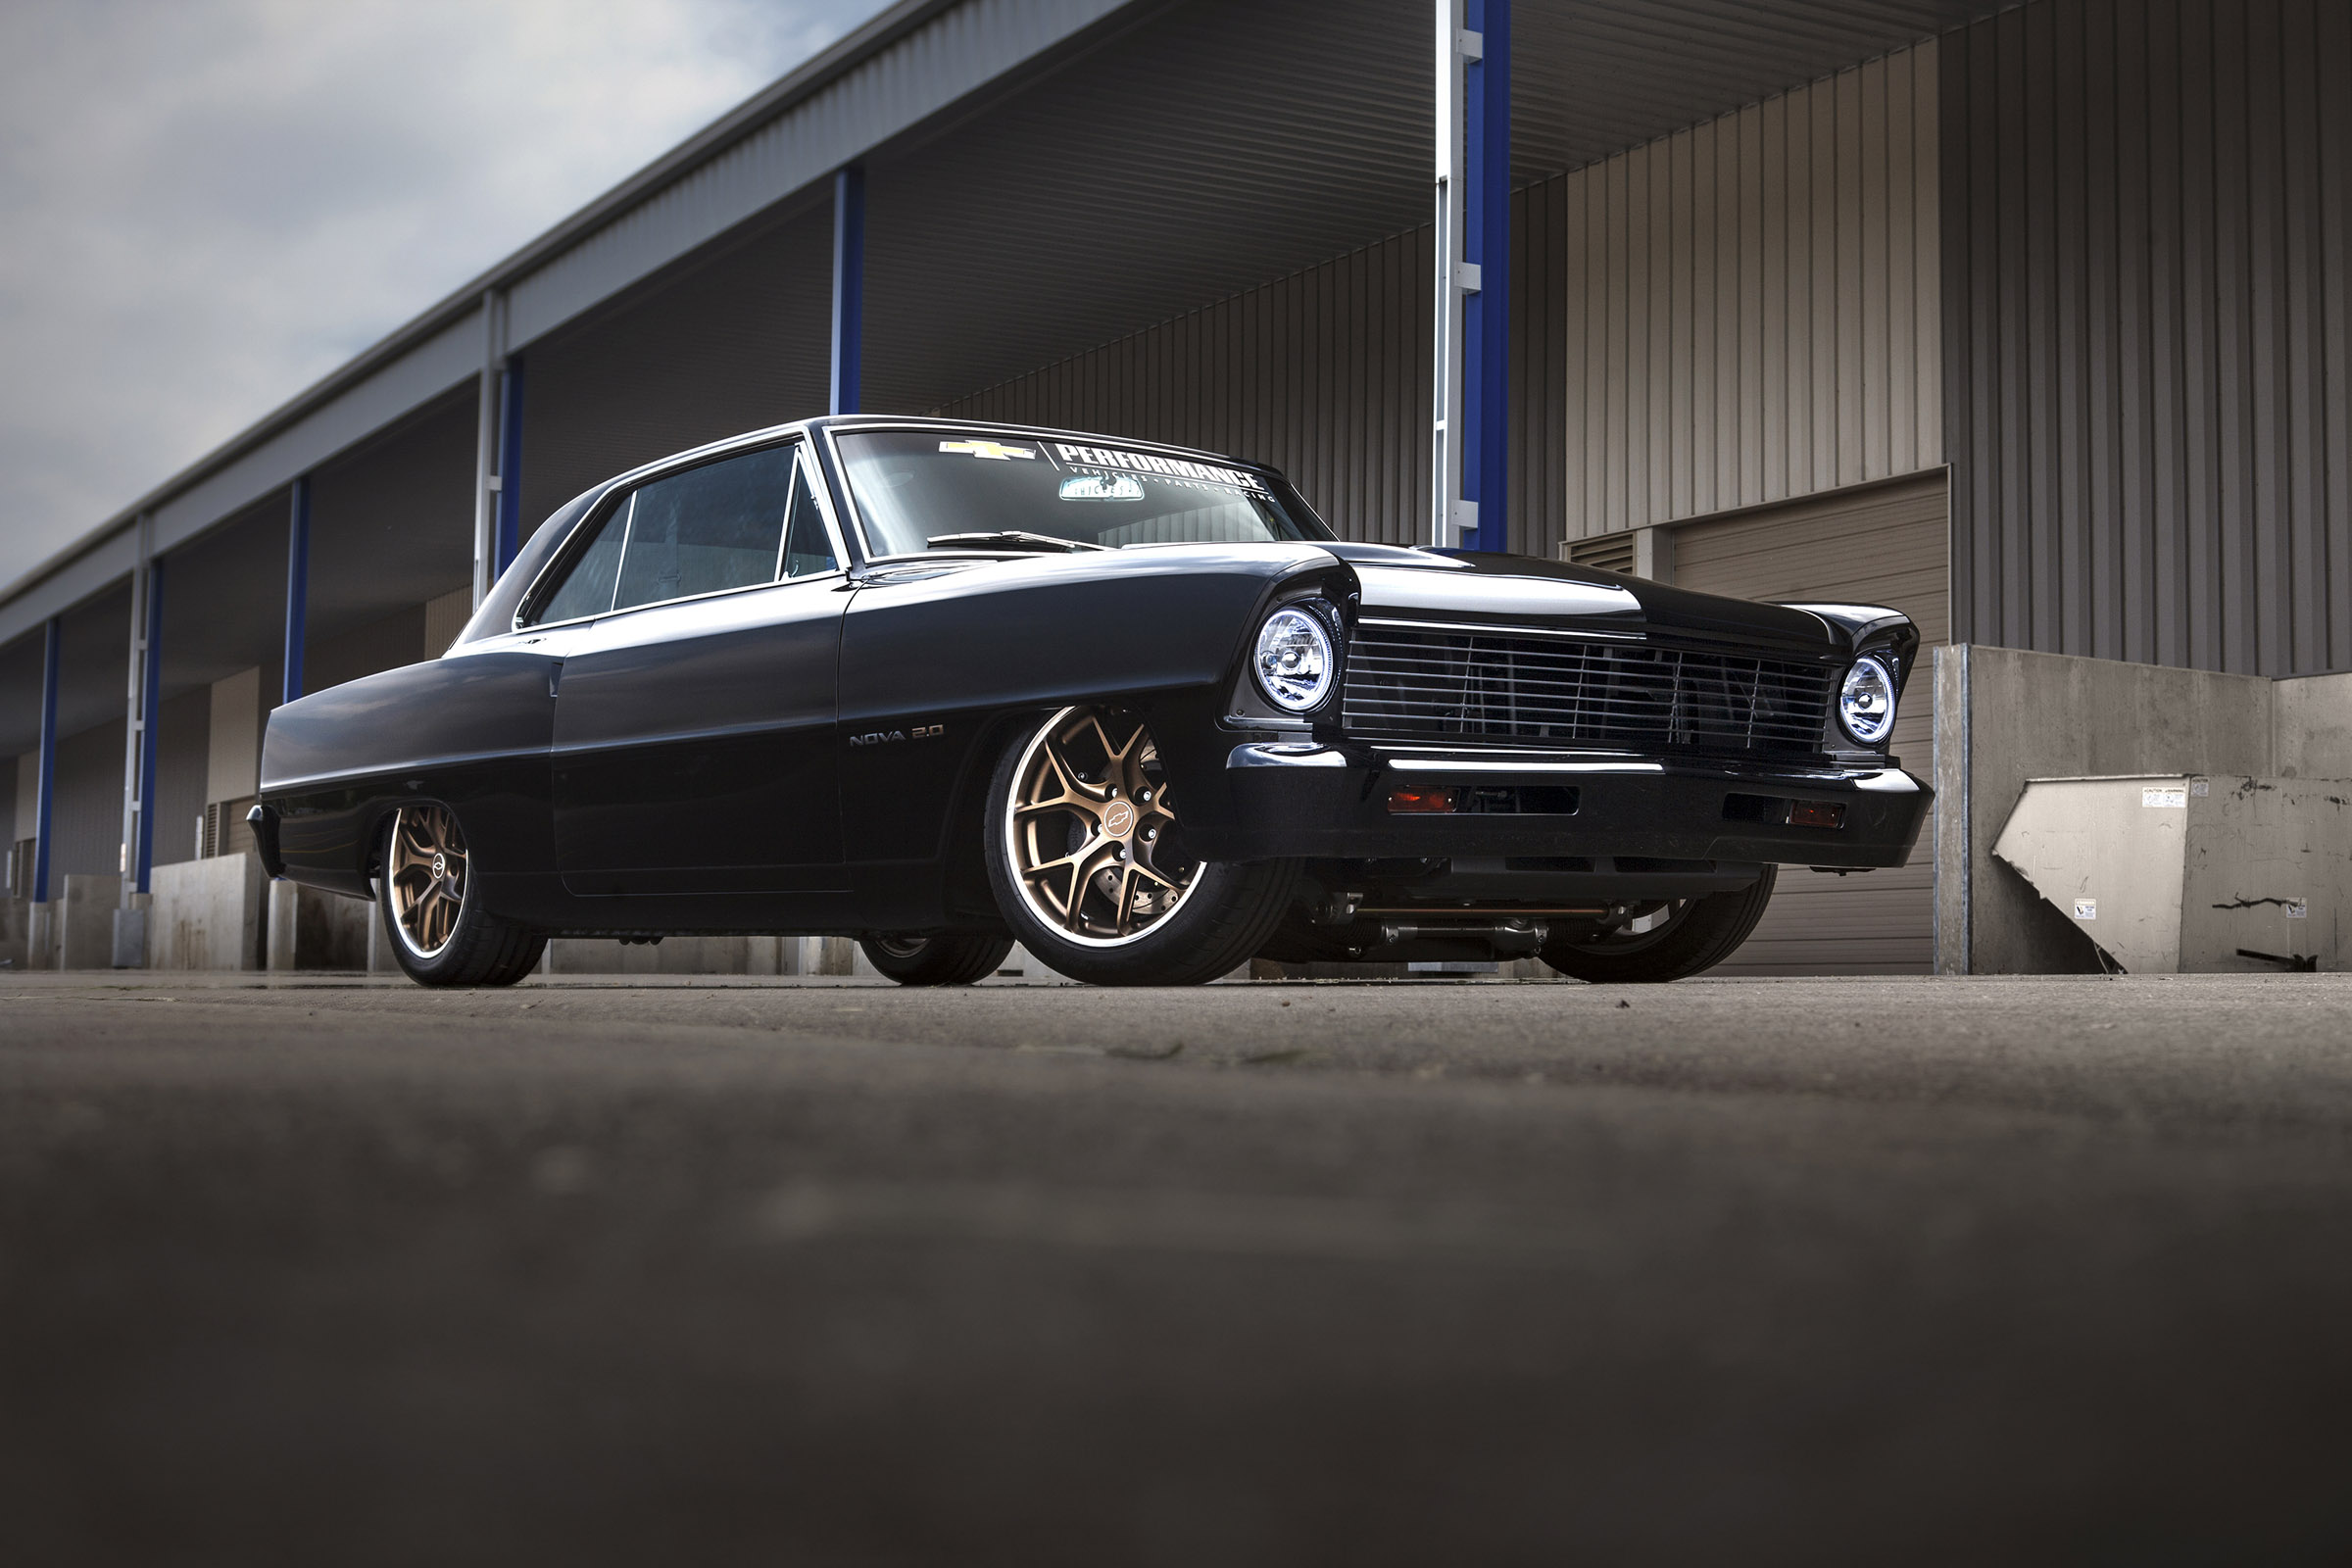 2015 Chevrolet 1967 Nova 2.0 Concept